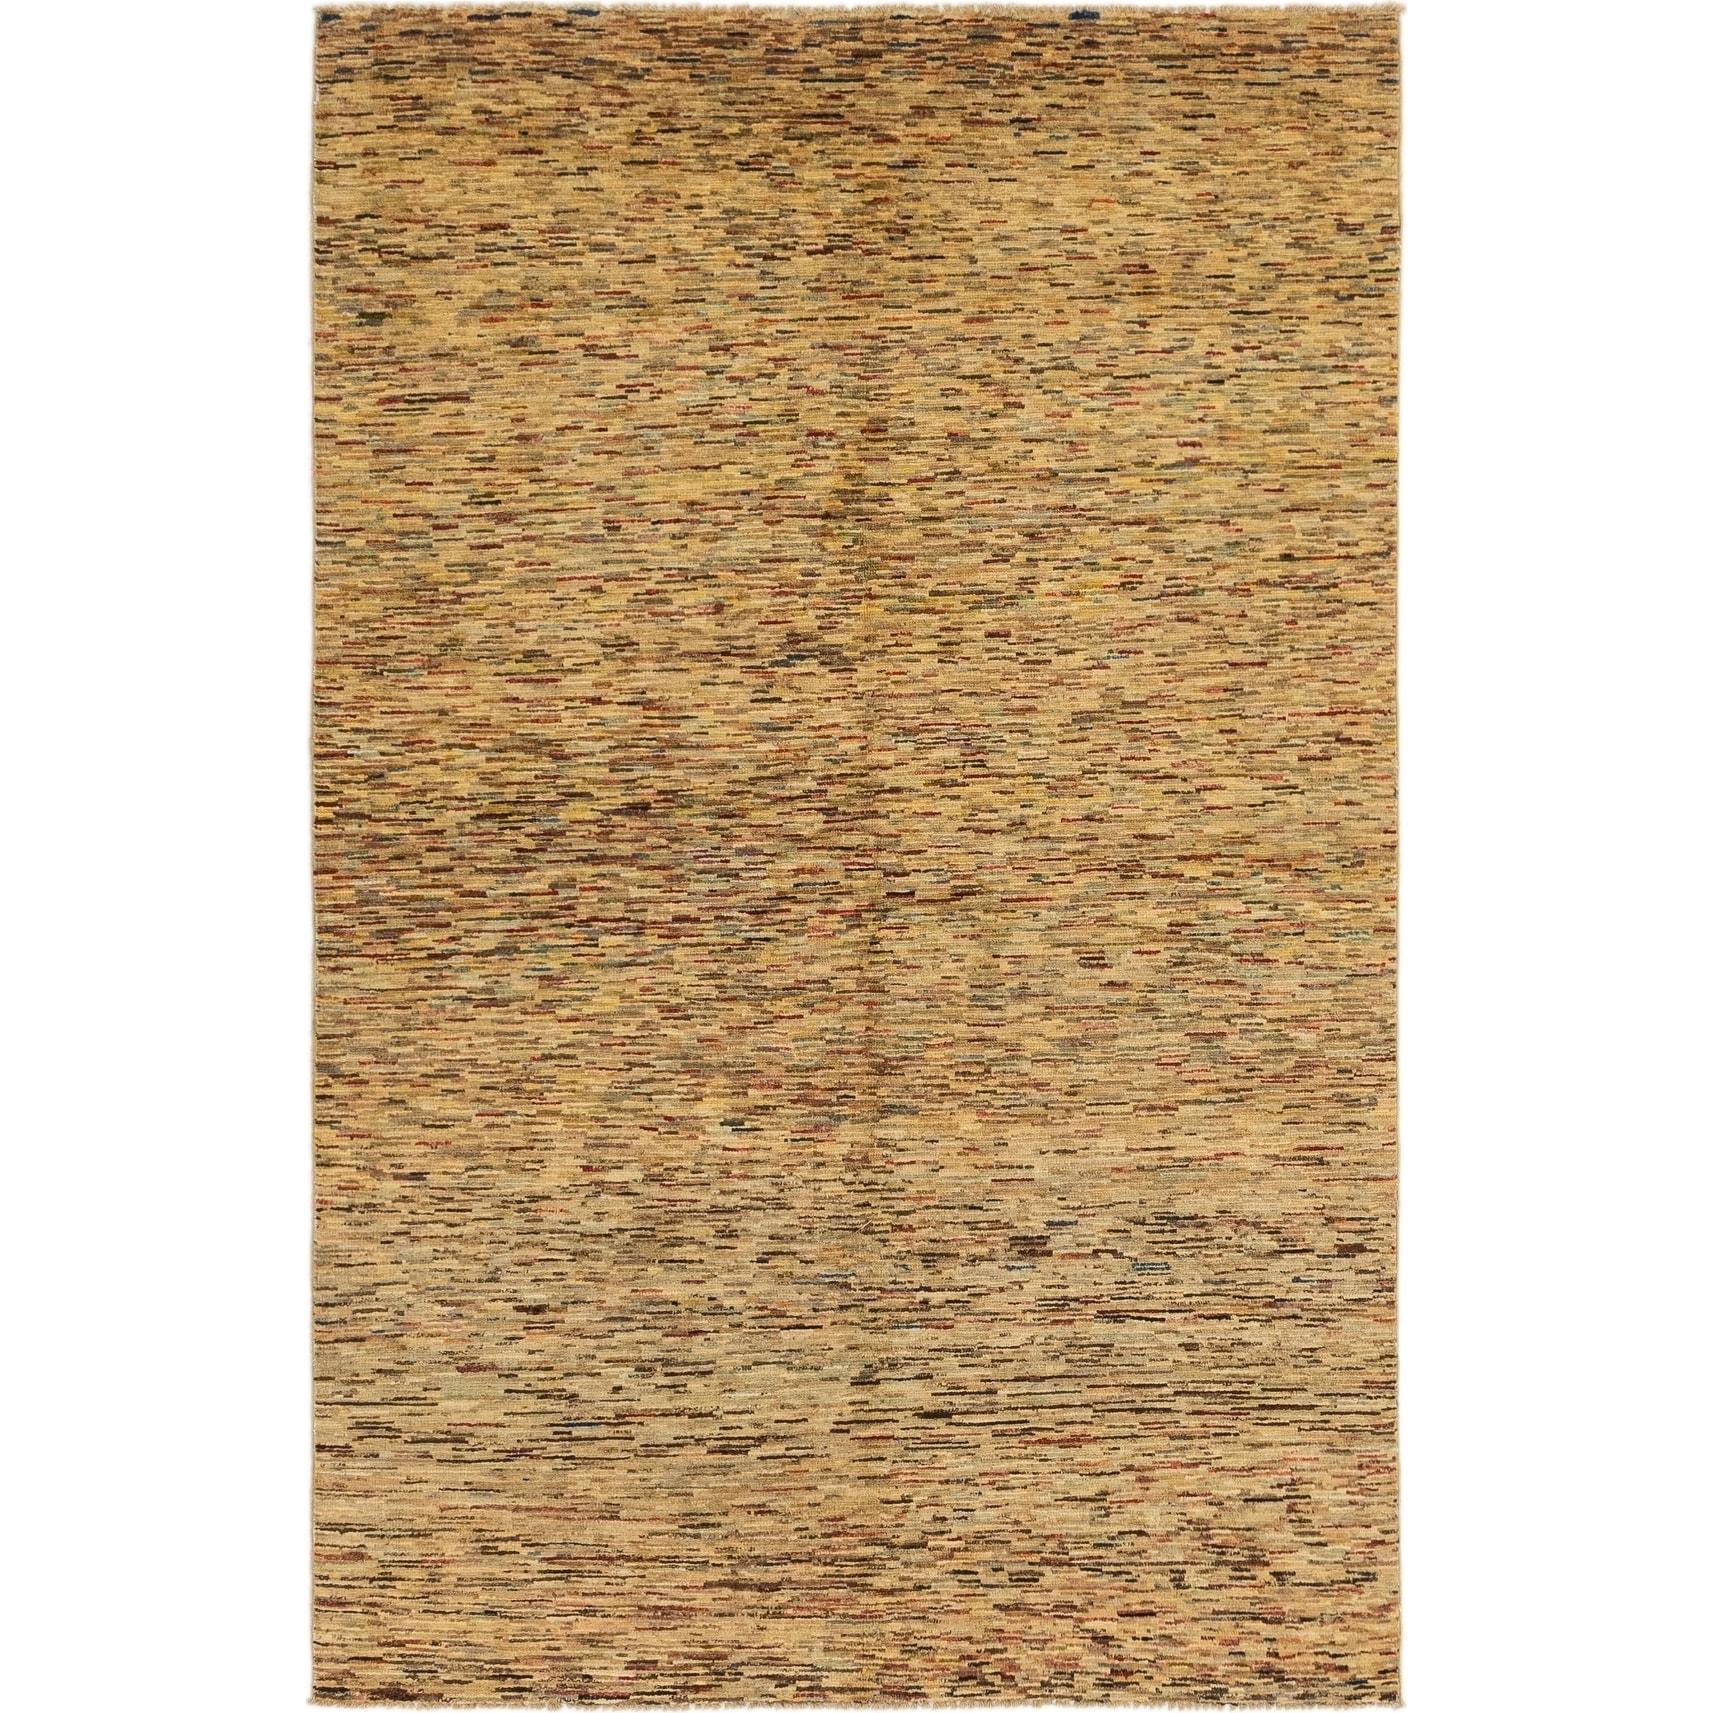 Hand Knotted Kashkuli Gabbeh Wool Area Rug - 5 2 x 8 2 (Multi - 5 2 x 8 2)